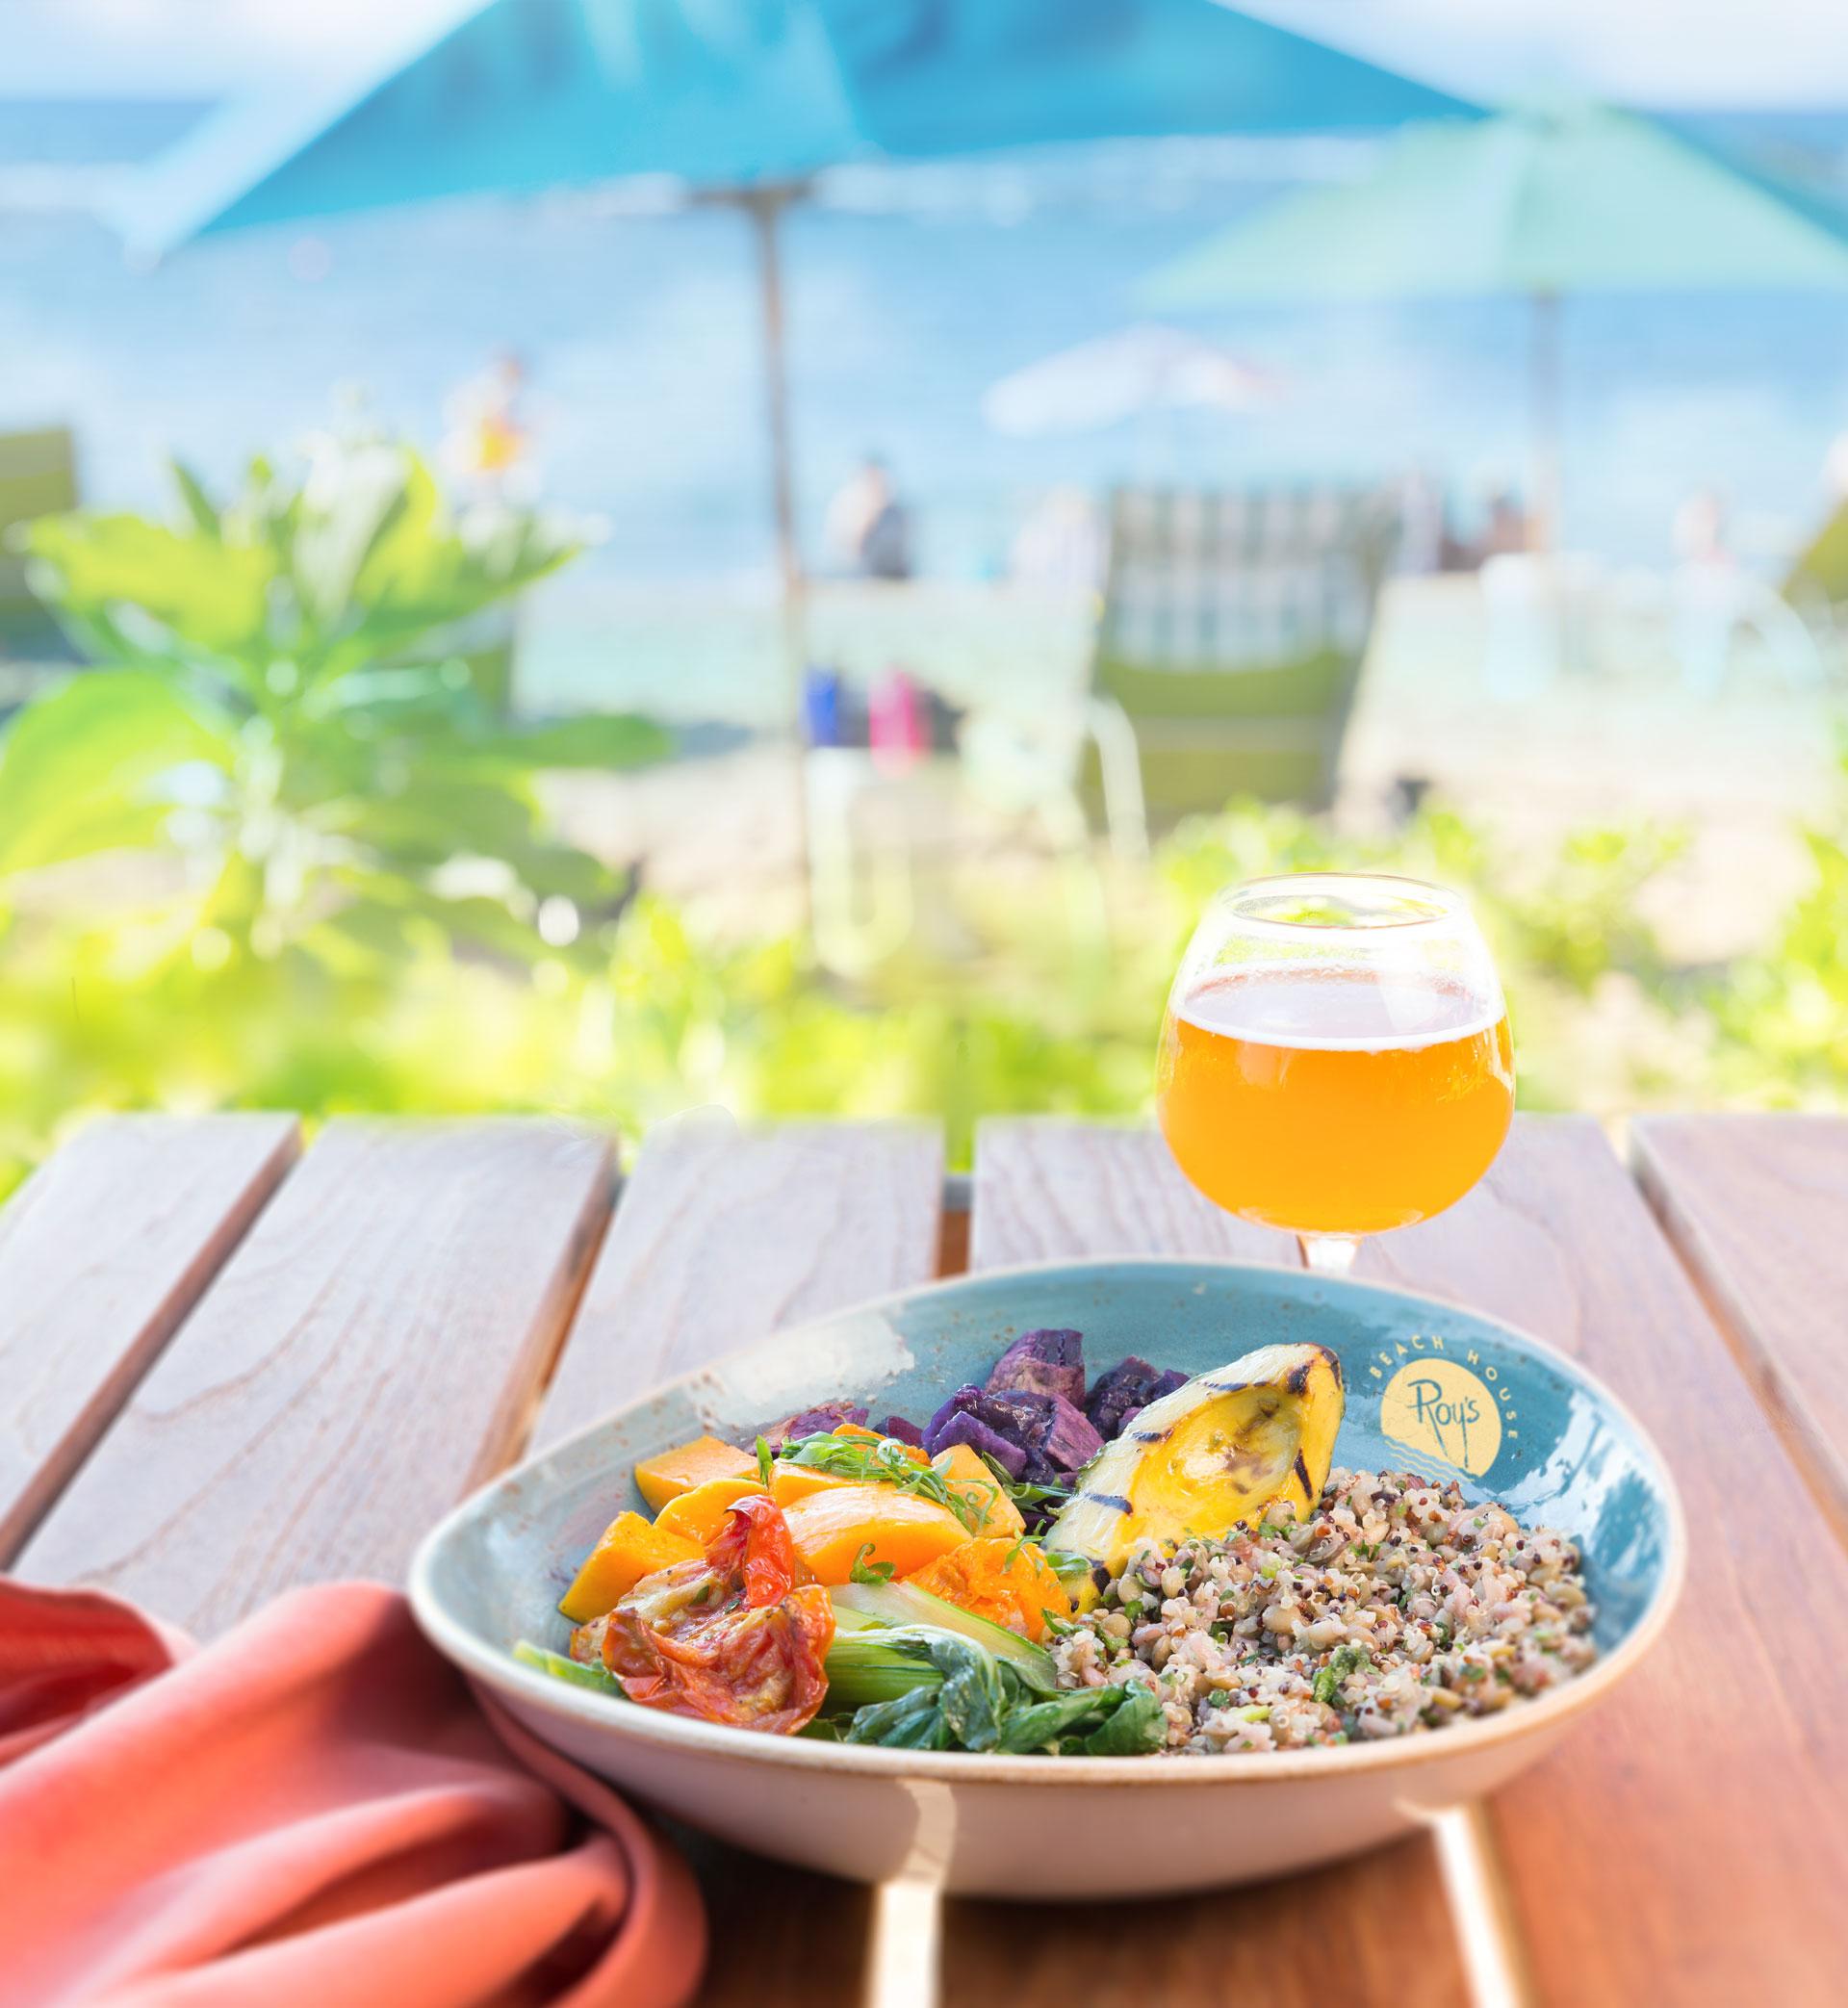 "Roy's-Beach-House_RBH-Protein-""Energy-Buddha-Bowl""-_-Roasted-Sweet-Potatoes,-Hau'ula-Tomatoes,-Butternut-Squash,-Mixed-Rice,-Grains-&-Lentils,-Grilled-Avocado__pc-Craig-Bixel_07-2017.jpg"